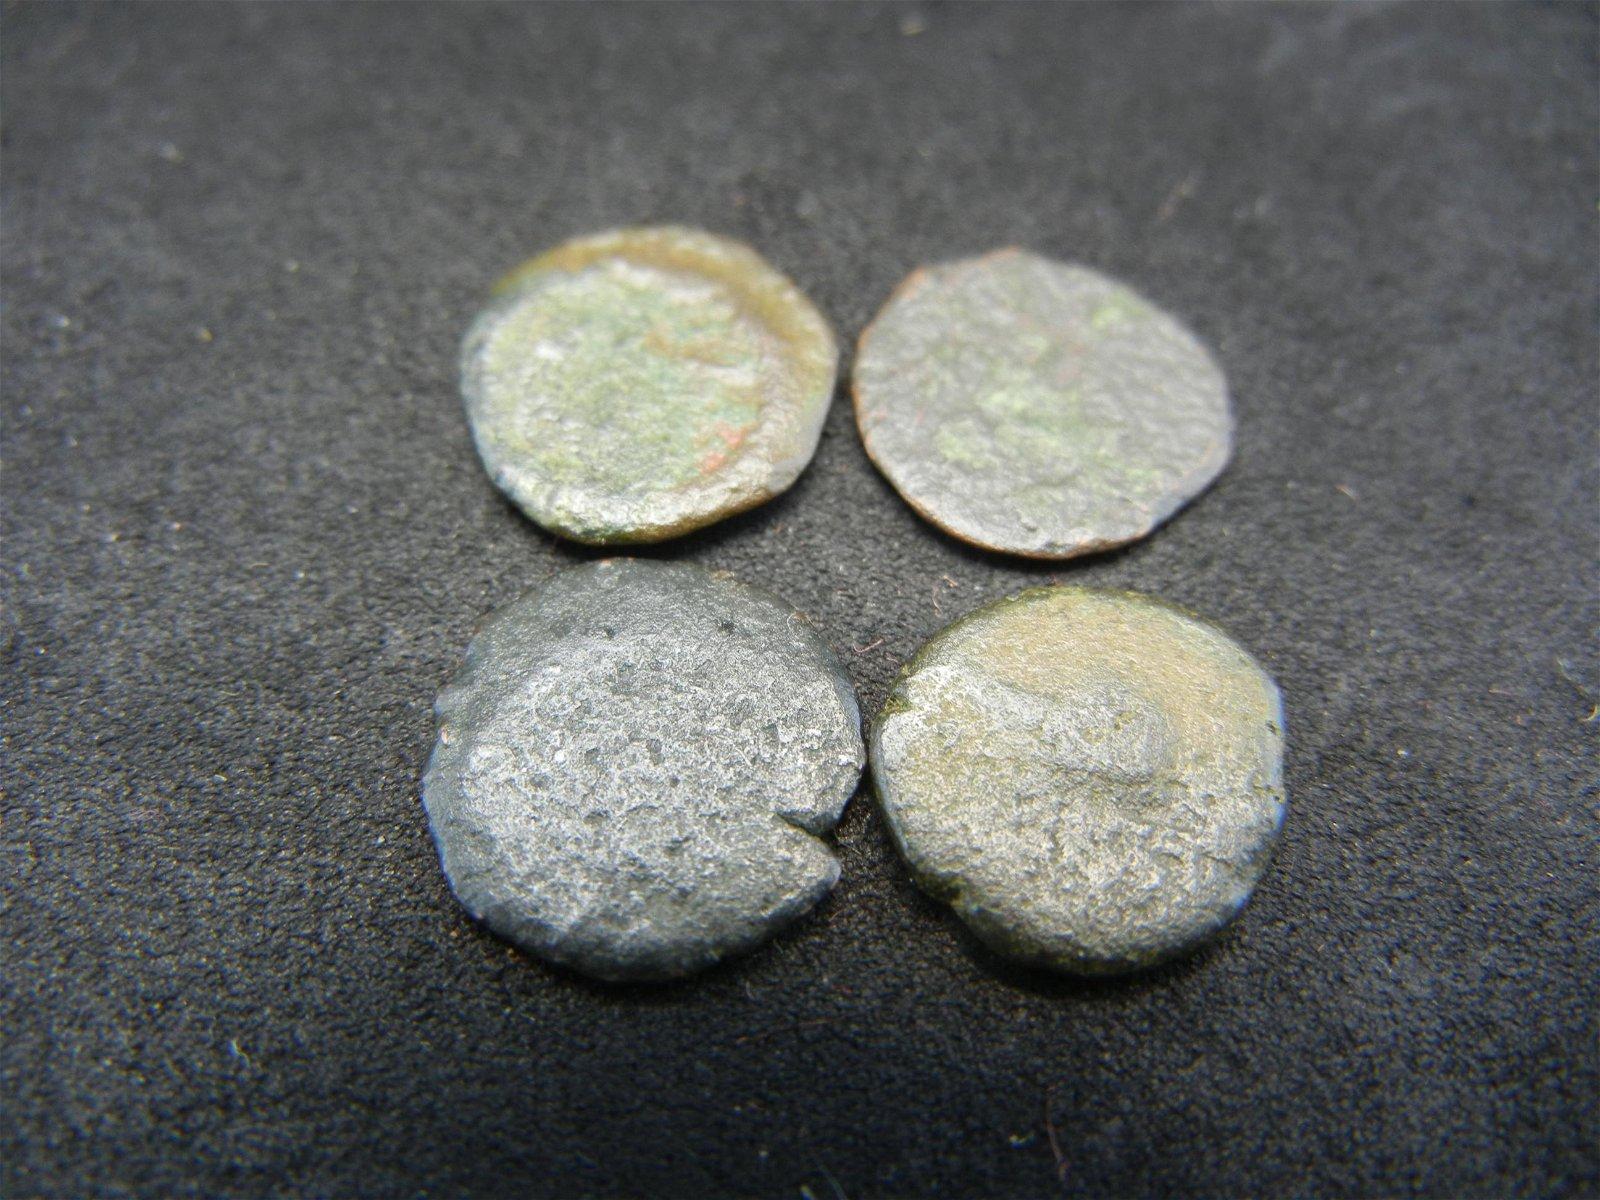 (4) 175-330 AD ANCIENT ROMAN COINS